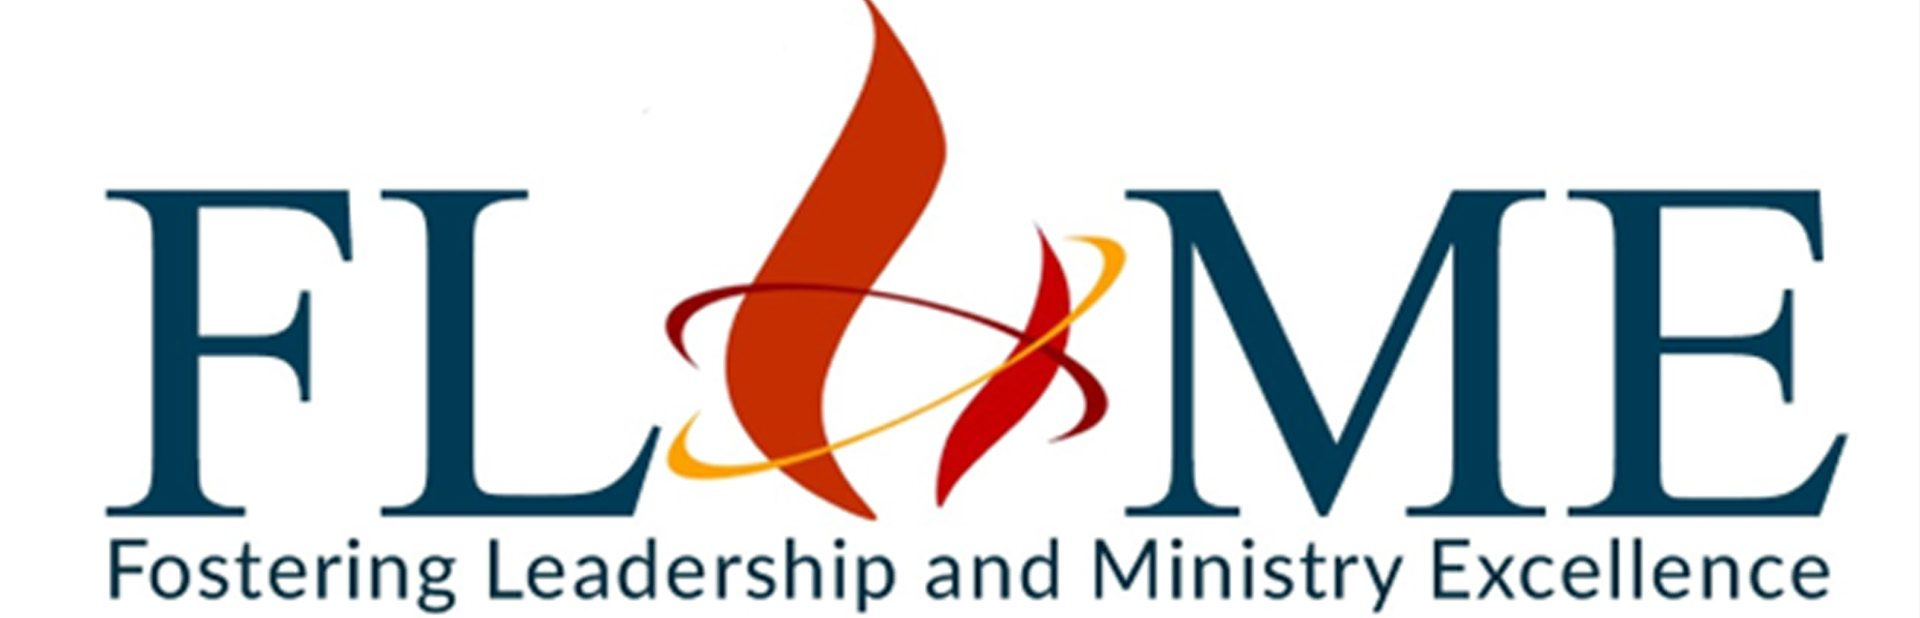 Flame Fellowship